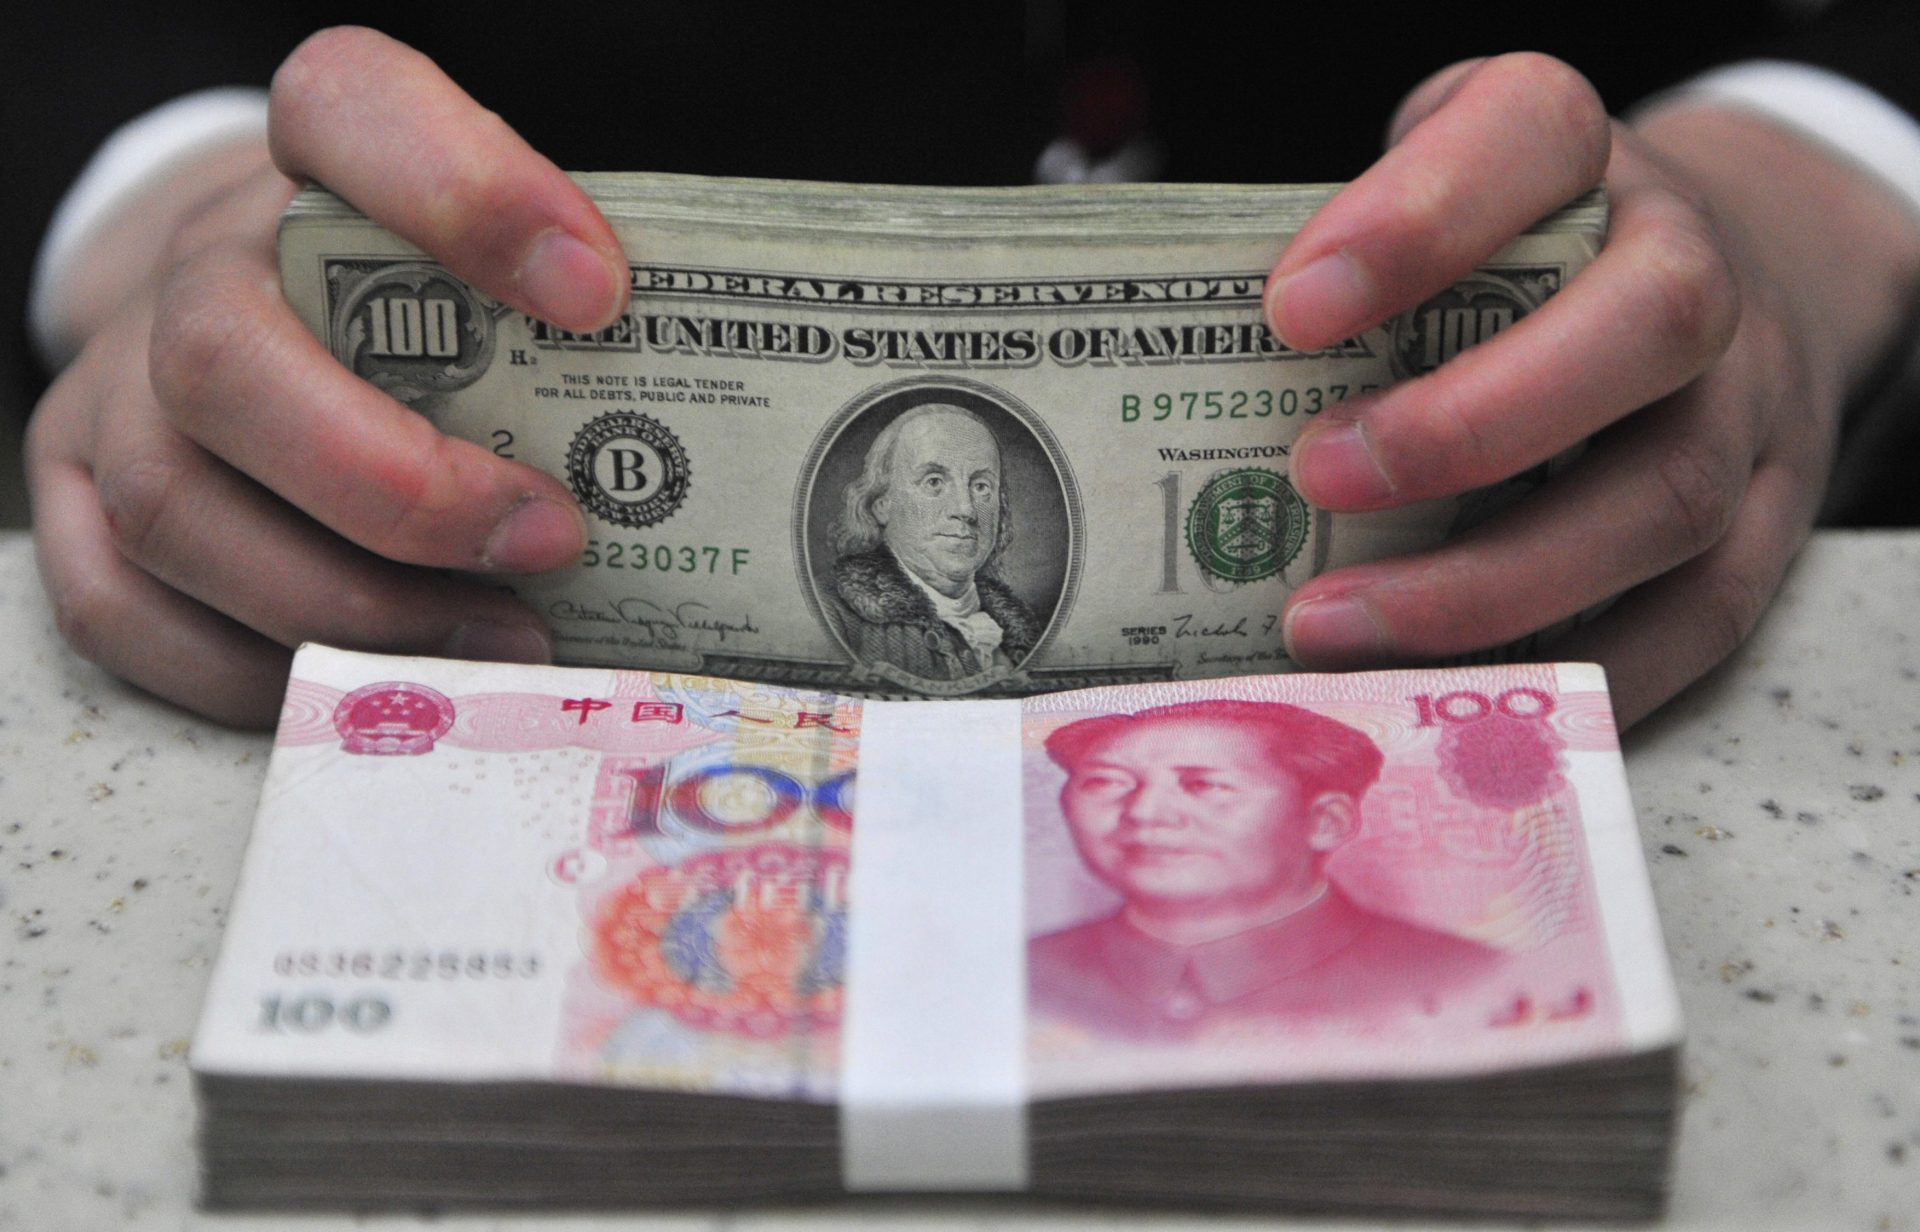 Trocas comerciais entre a China e países de língua portuguesa